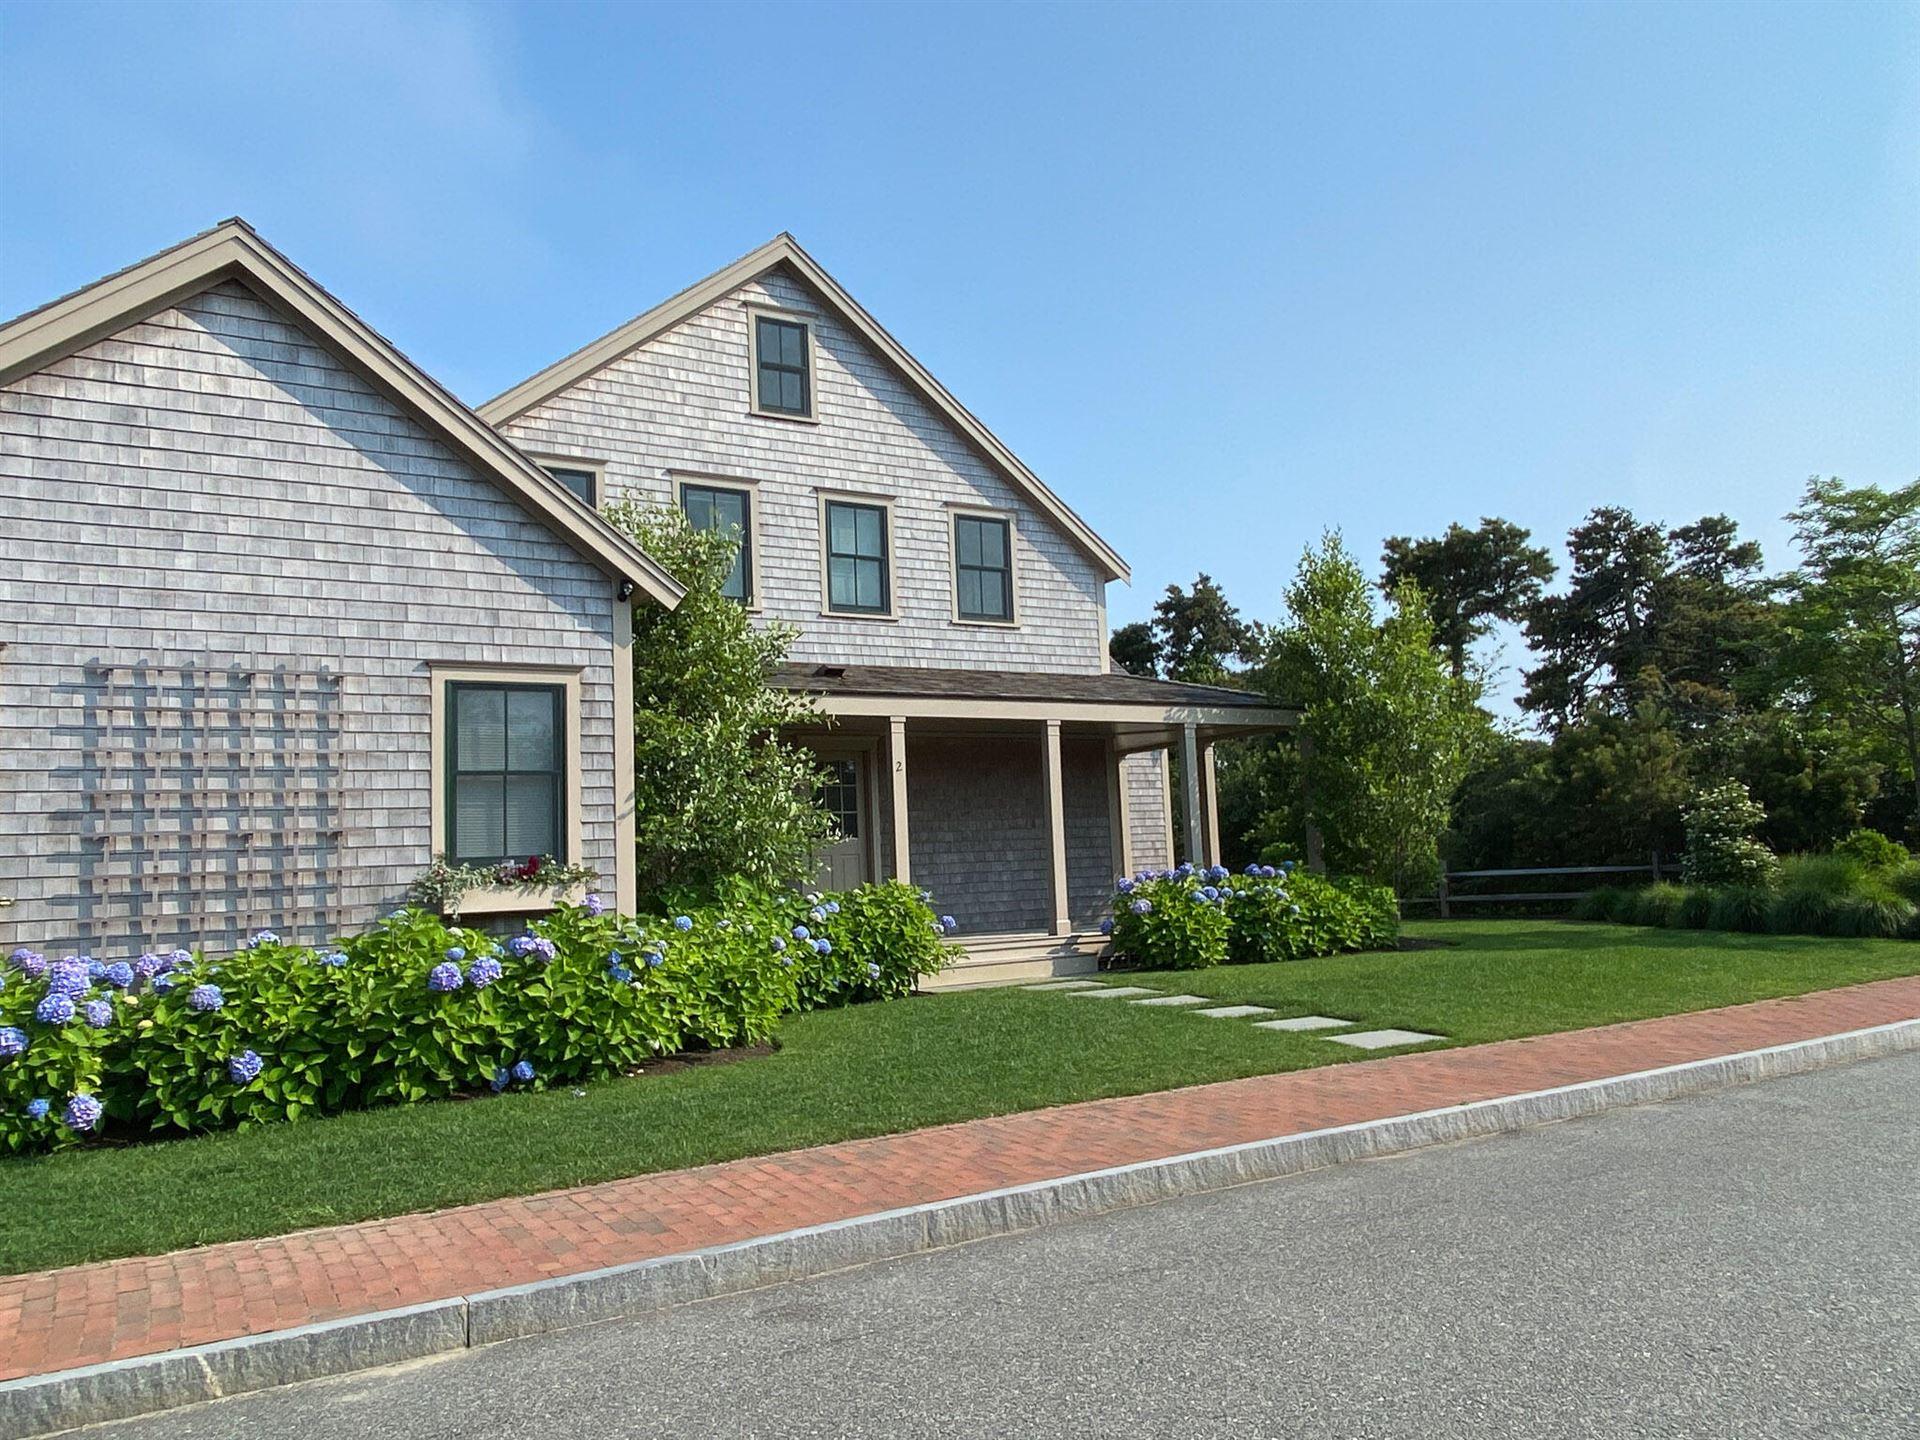 Photo of 2 Wood Lily Road, Nantucket, MA 02554 (MLS # 22104217)